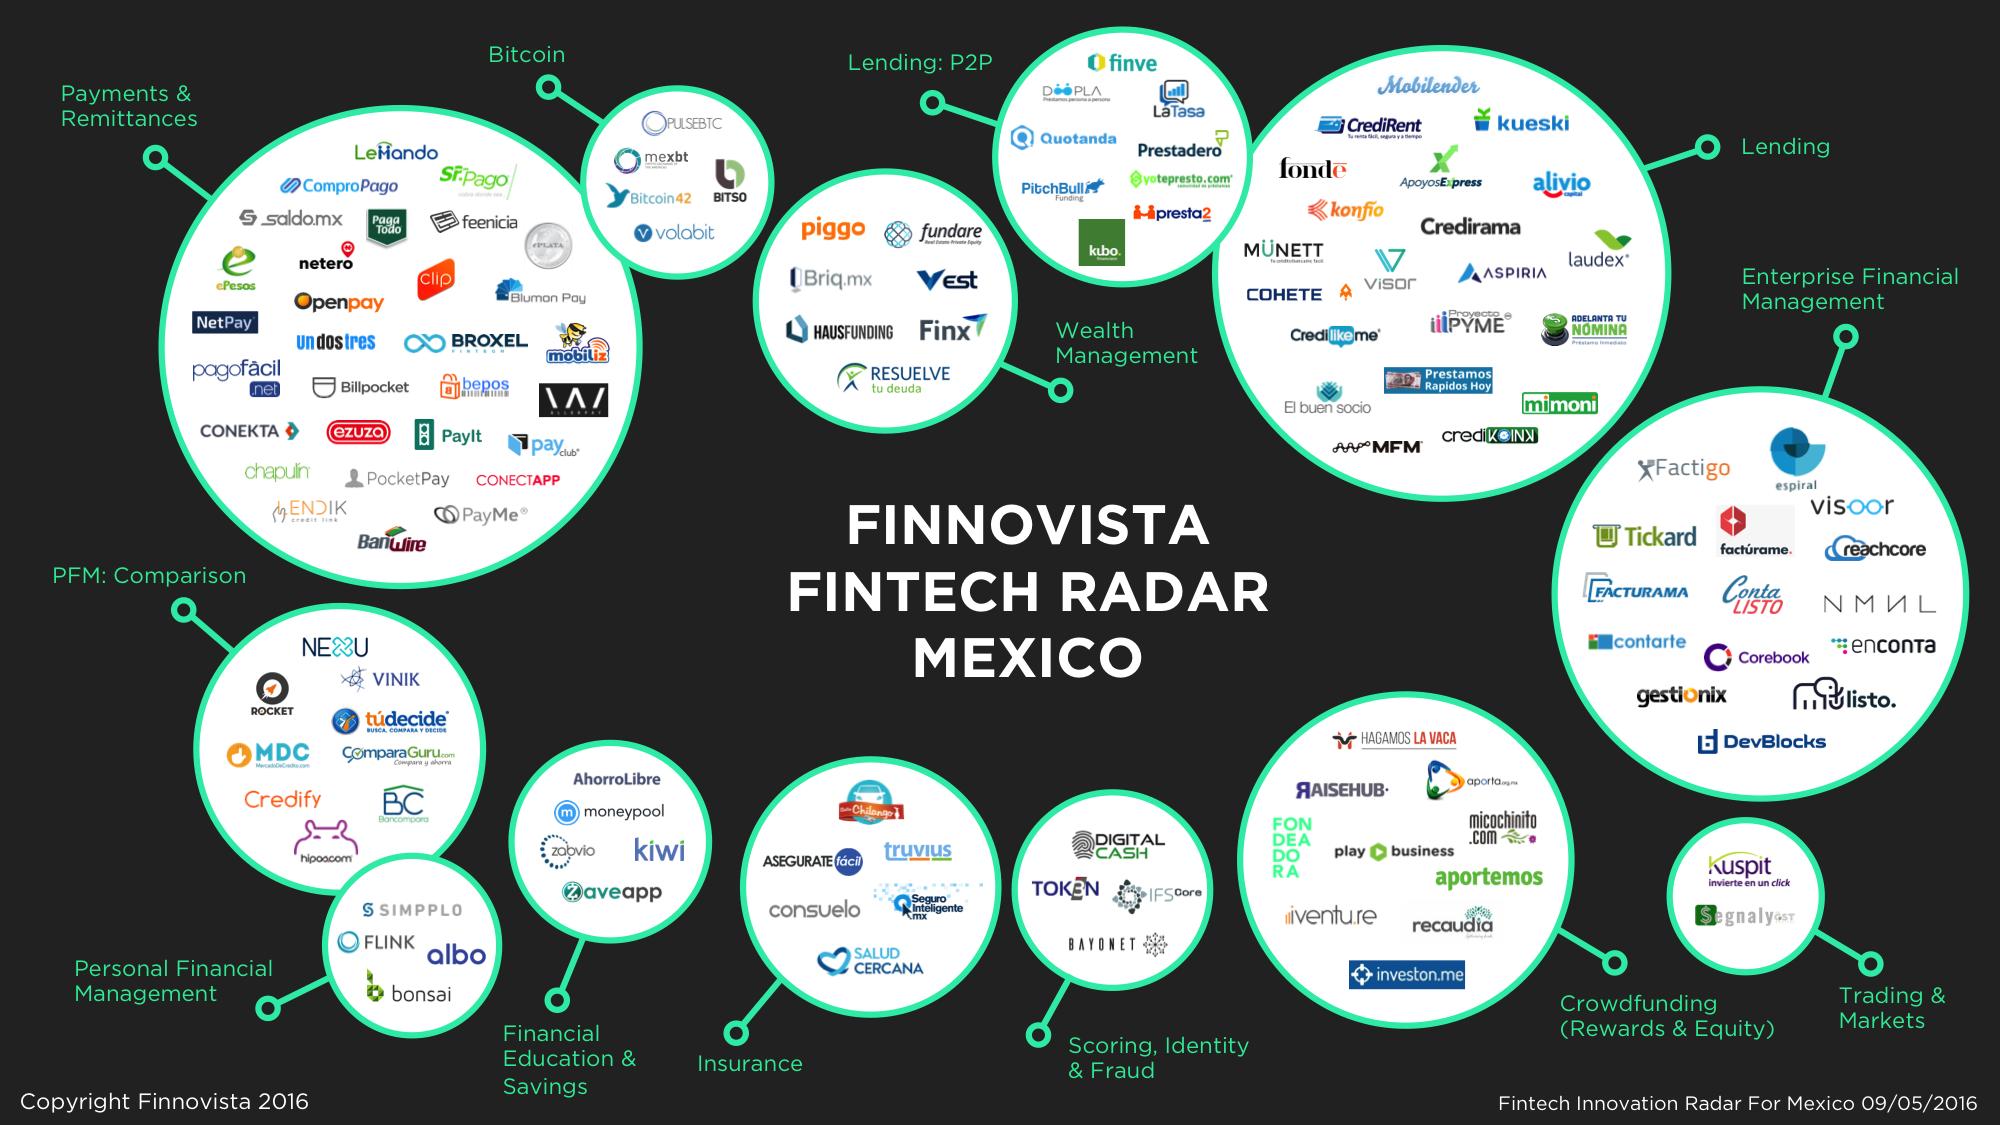 Mexico_Fintech_Radar_Def_DA.png